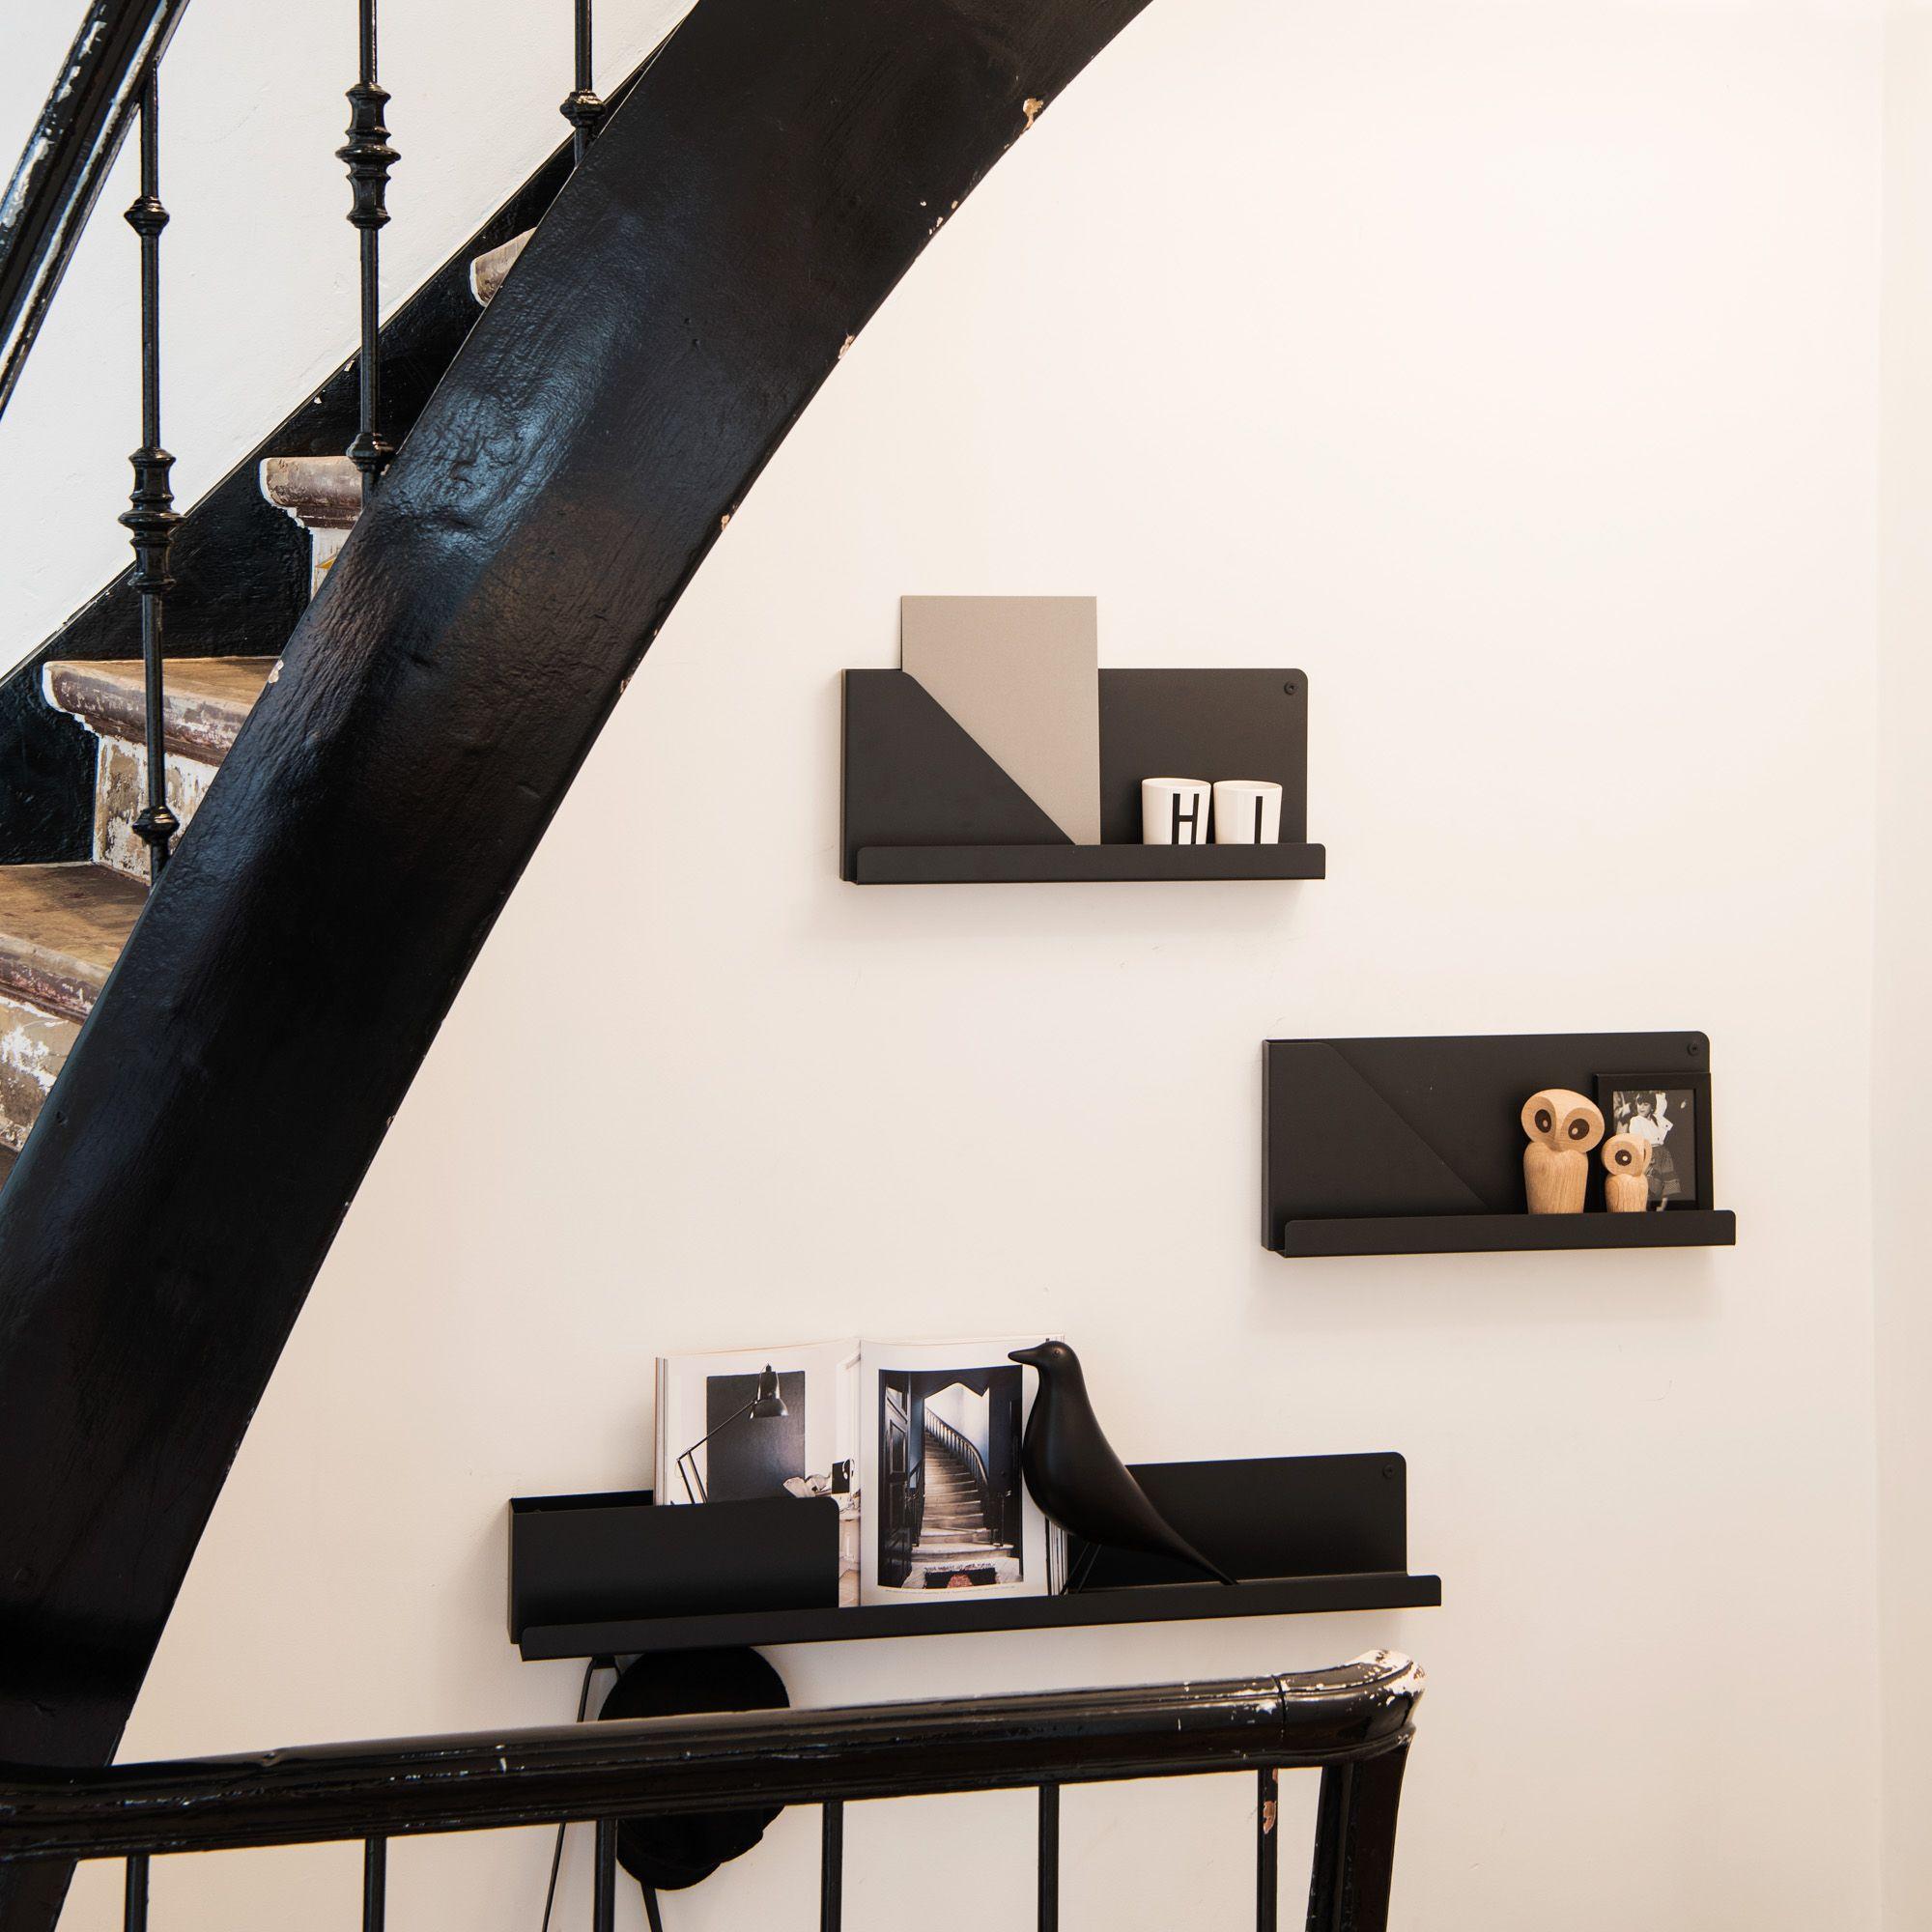 Muuto FOLDED shelves by Johan van Hengel at Mobilia